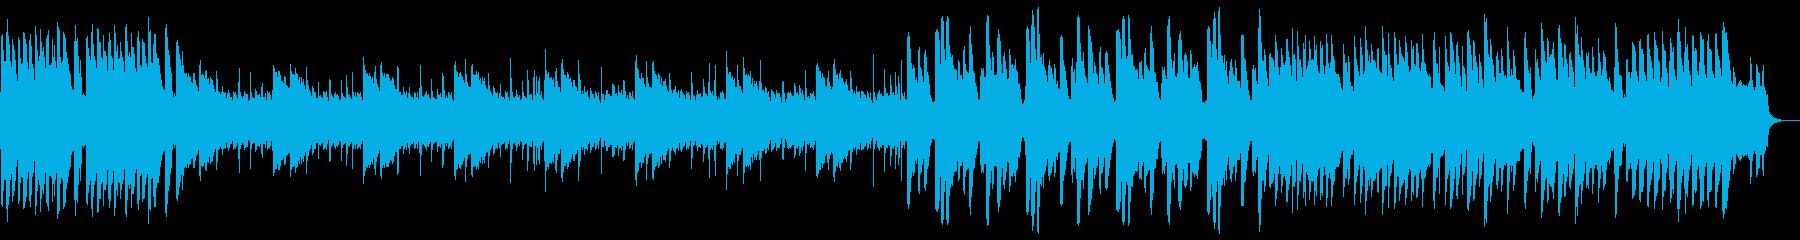 8bit コミカルな宇宙 1コーラス版の再生済みの波形